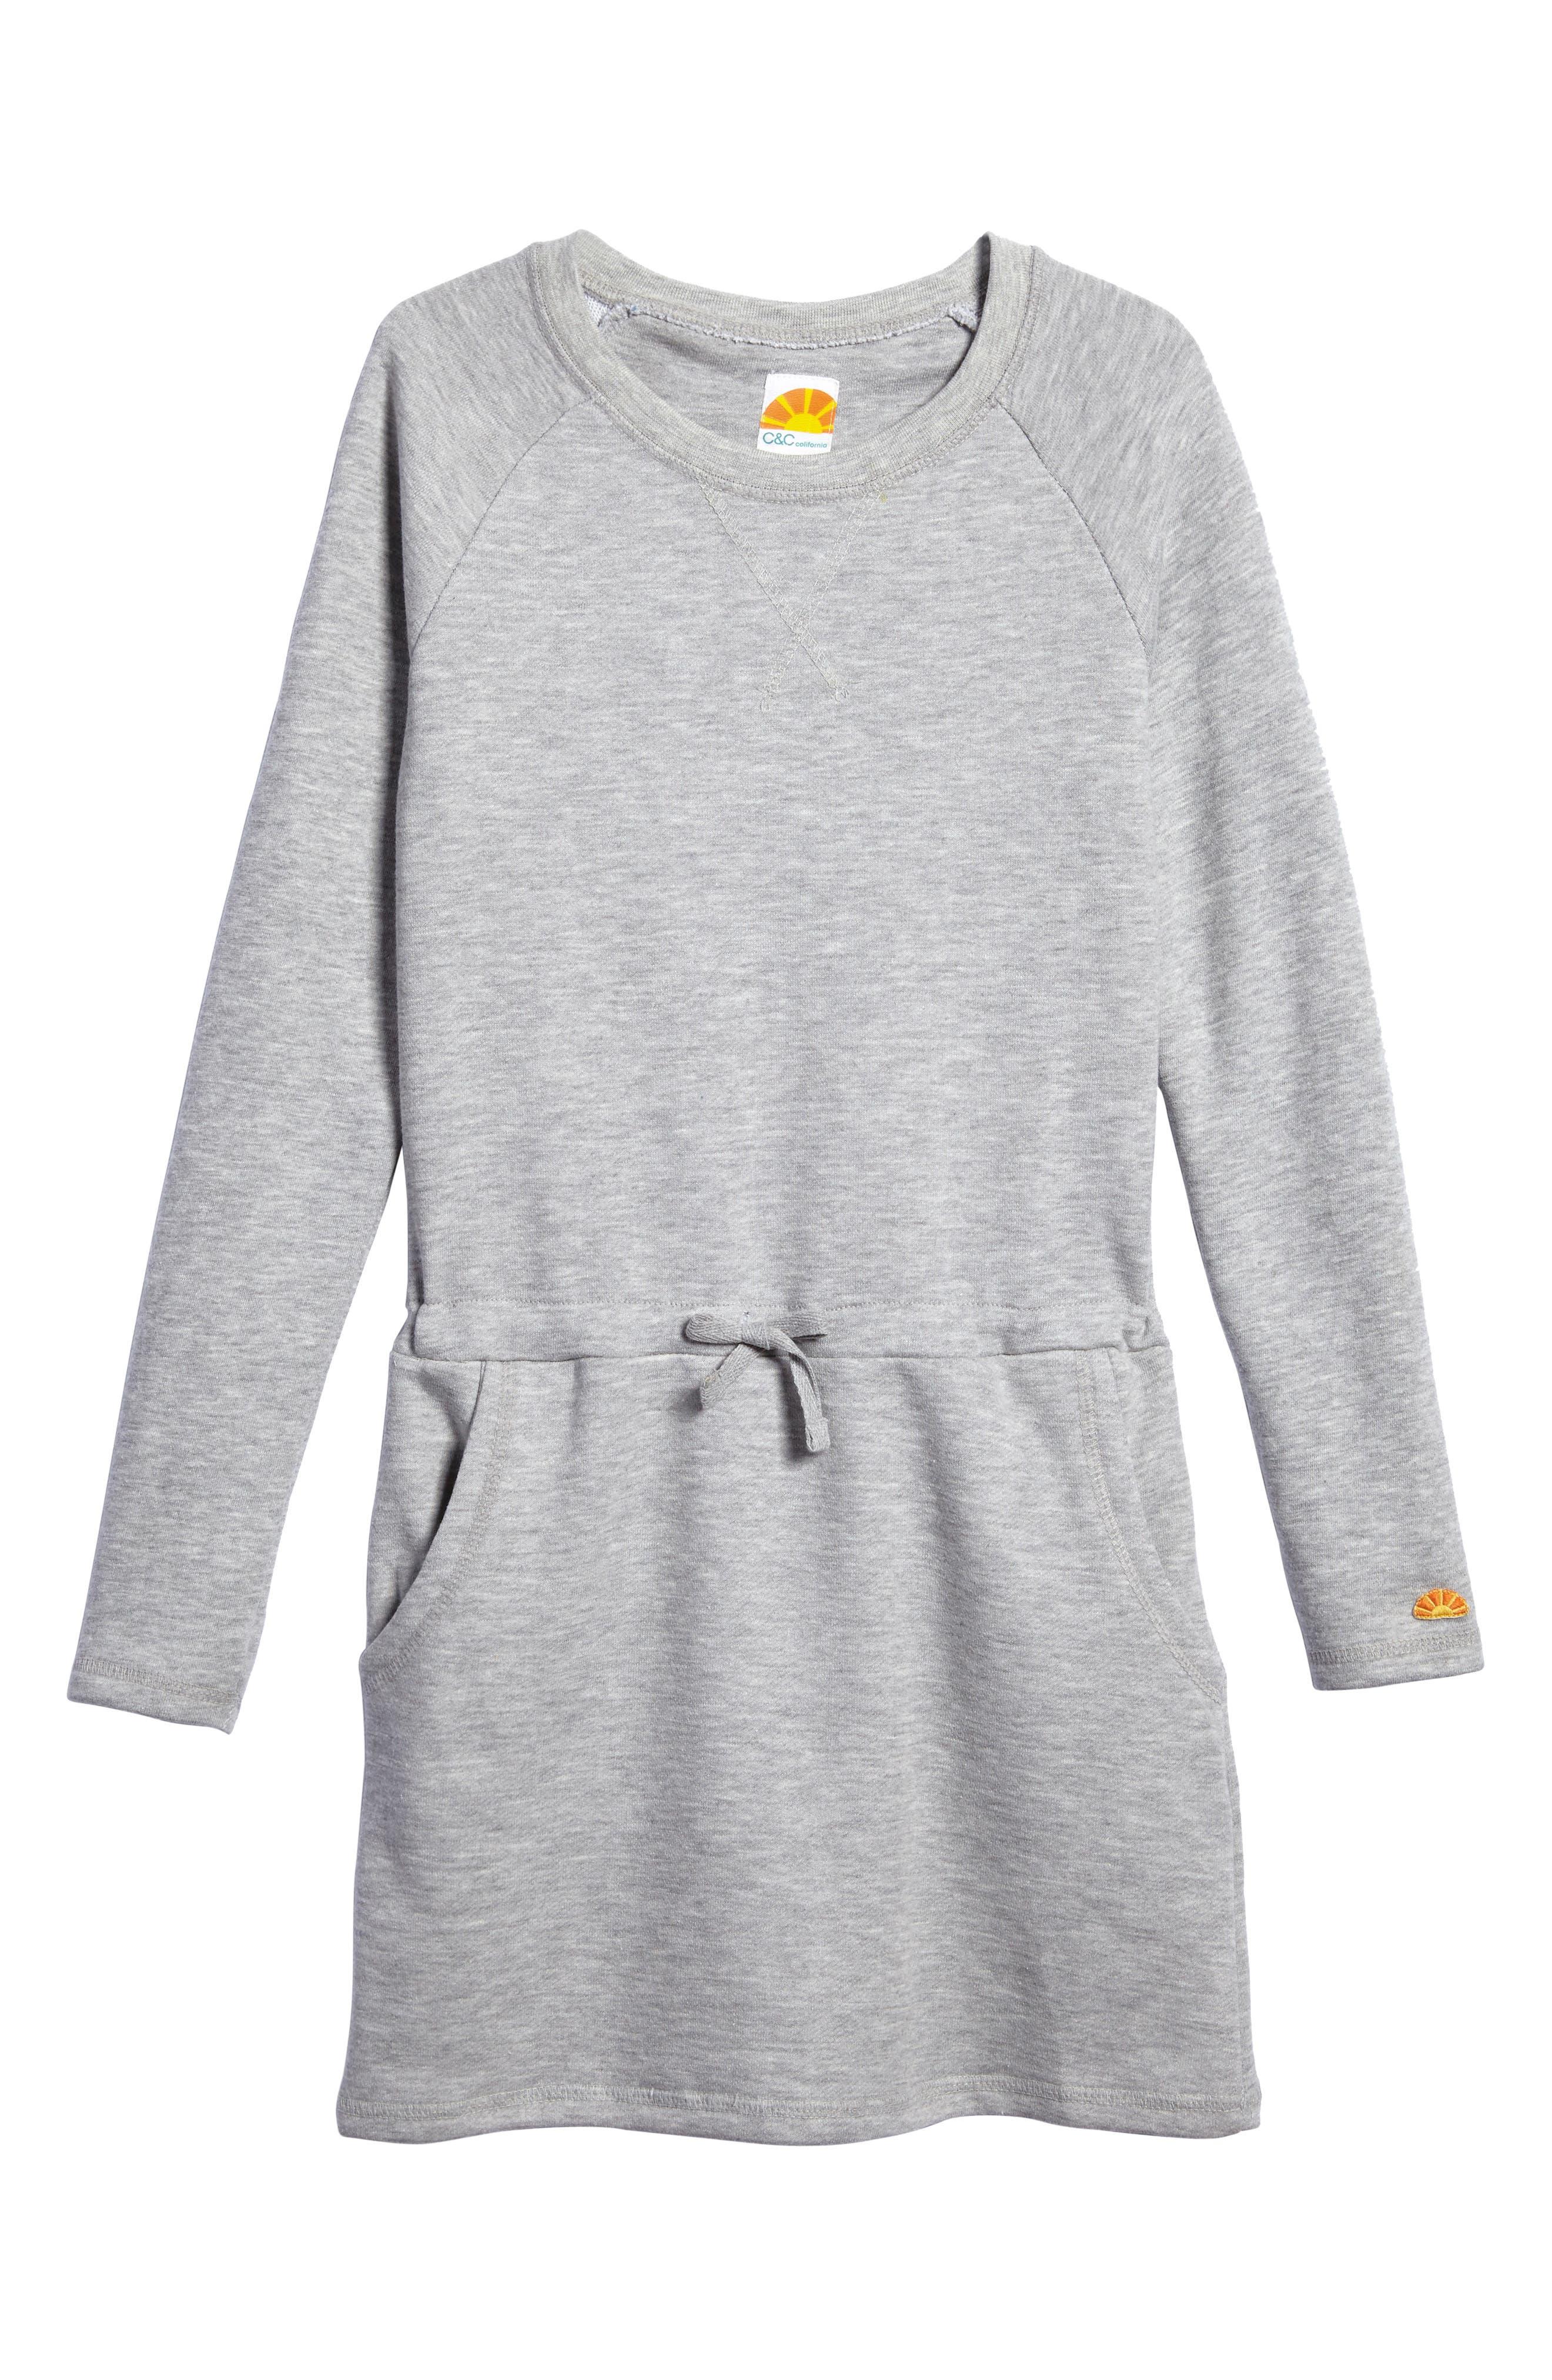 Sweatshirt Dress,                             Main thumbnail 1, color,                             Pearl Heather